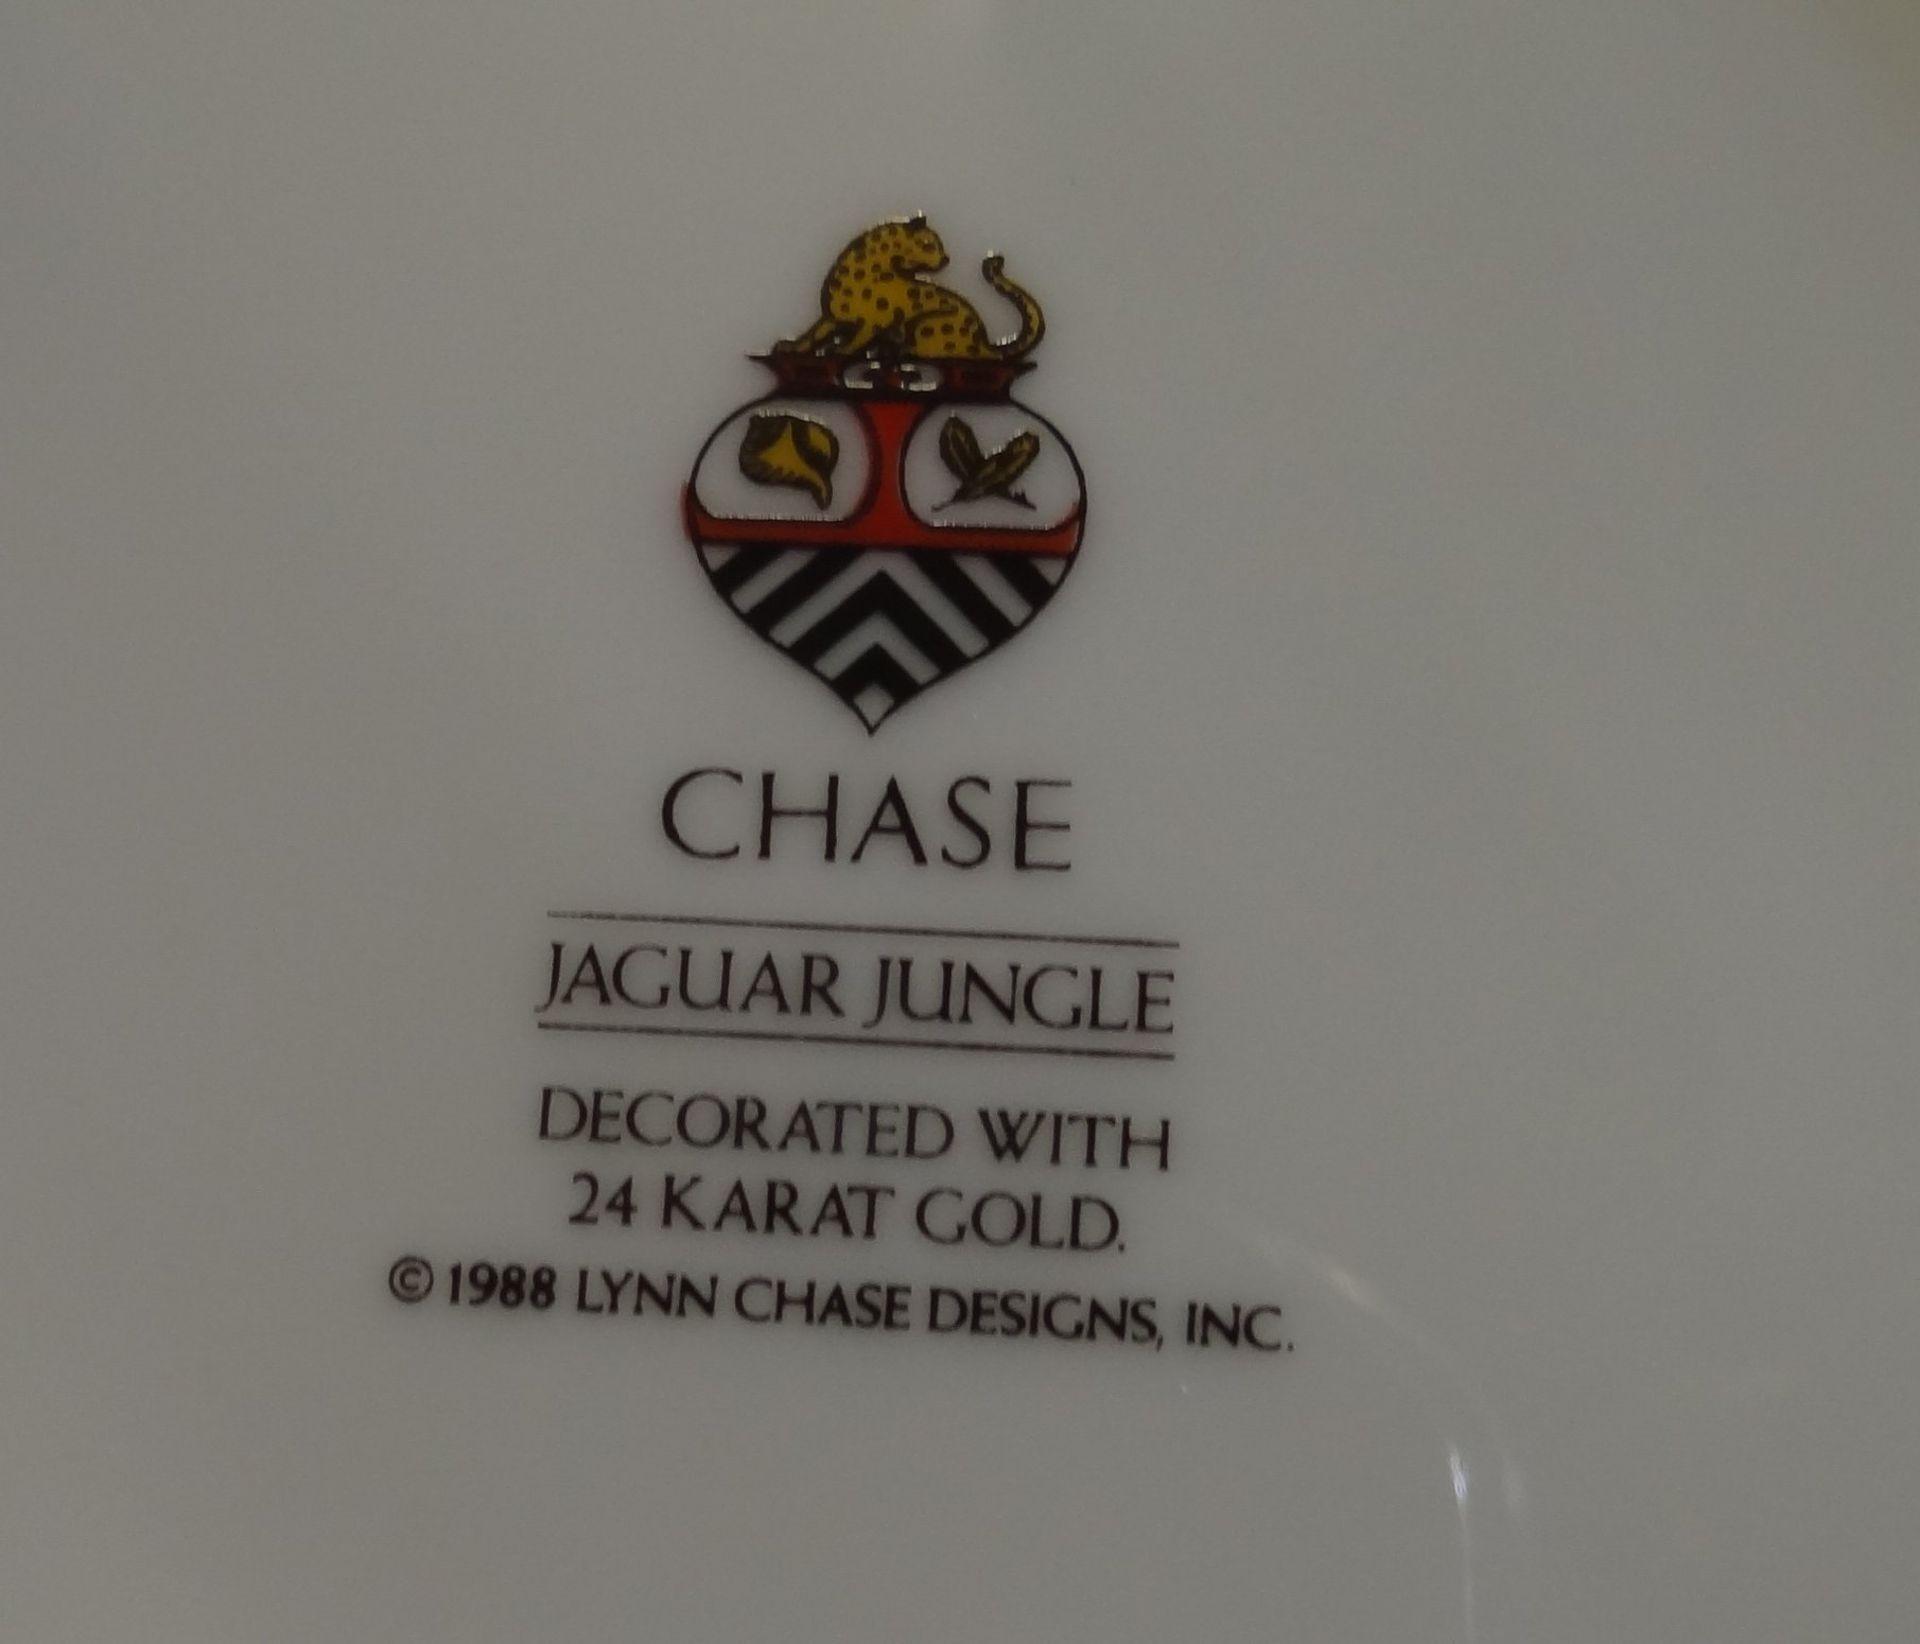 "12x Brot-oder Kuchenteller ""Chase Jaguar Jungle"" 1988,neuwertig in 2 orig. Kartons, D-16 cm (6 1/ - Bild 5 aus 5"